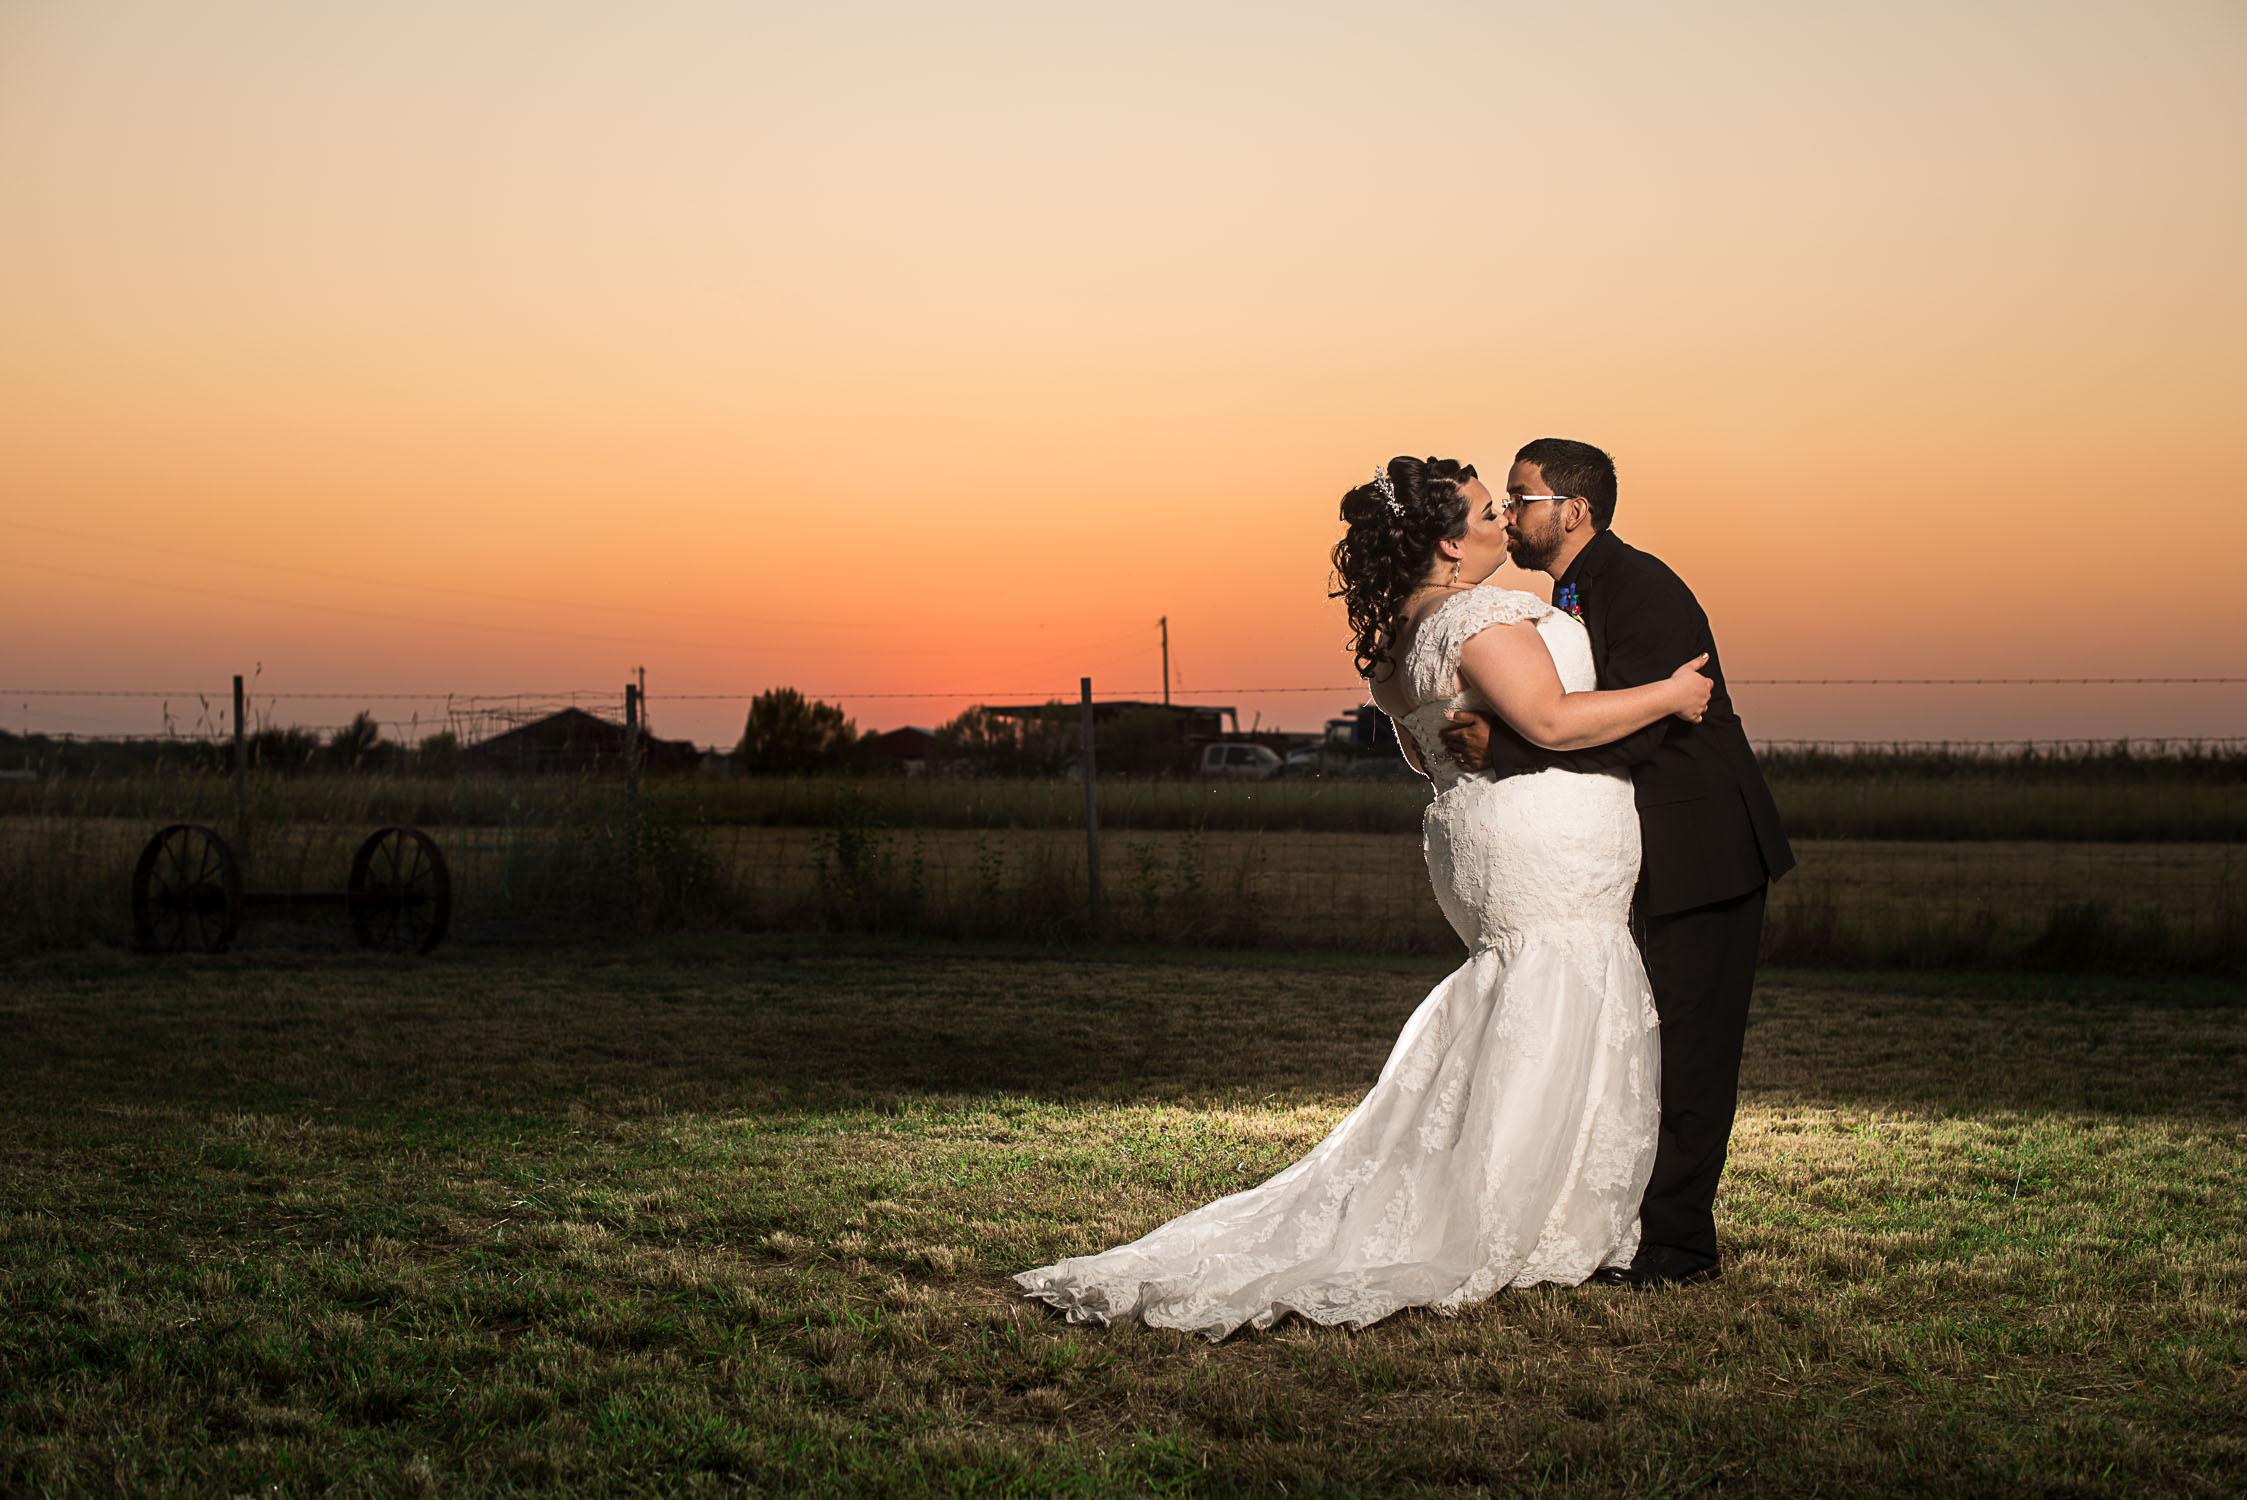 Leal Wedding Mira Visu Photography-144.jpg